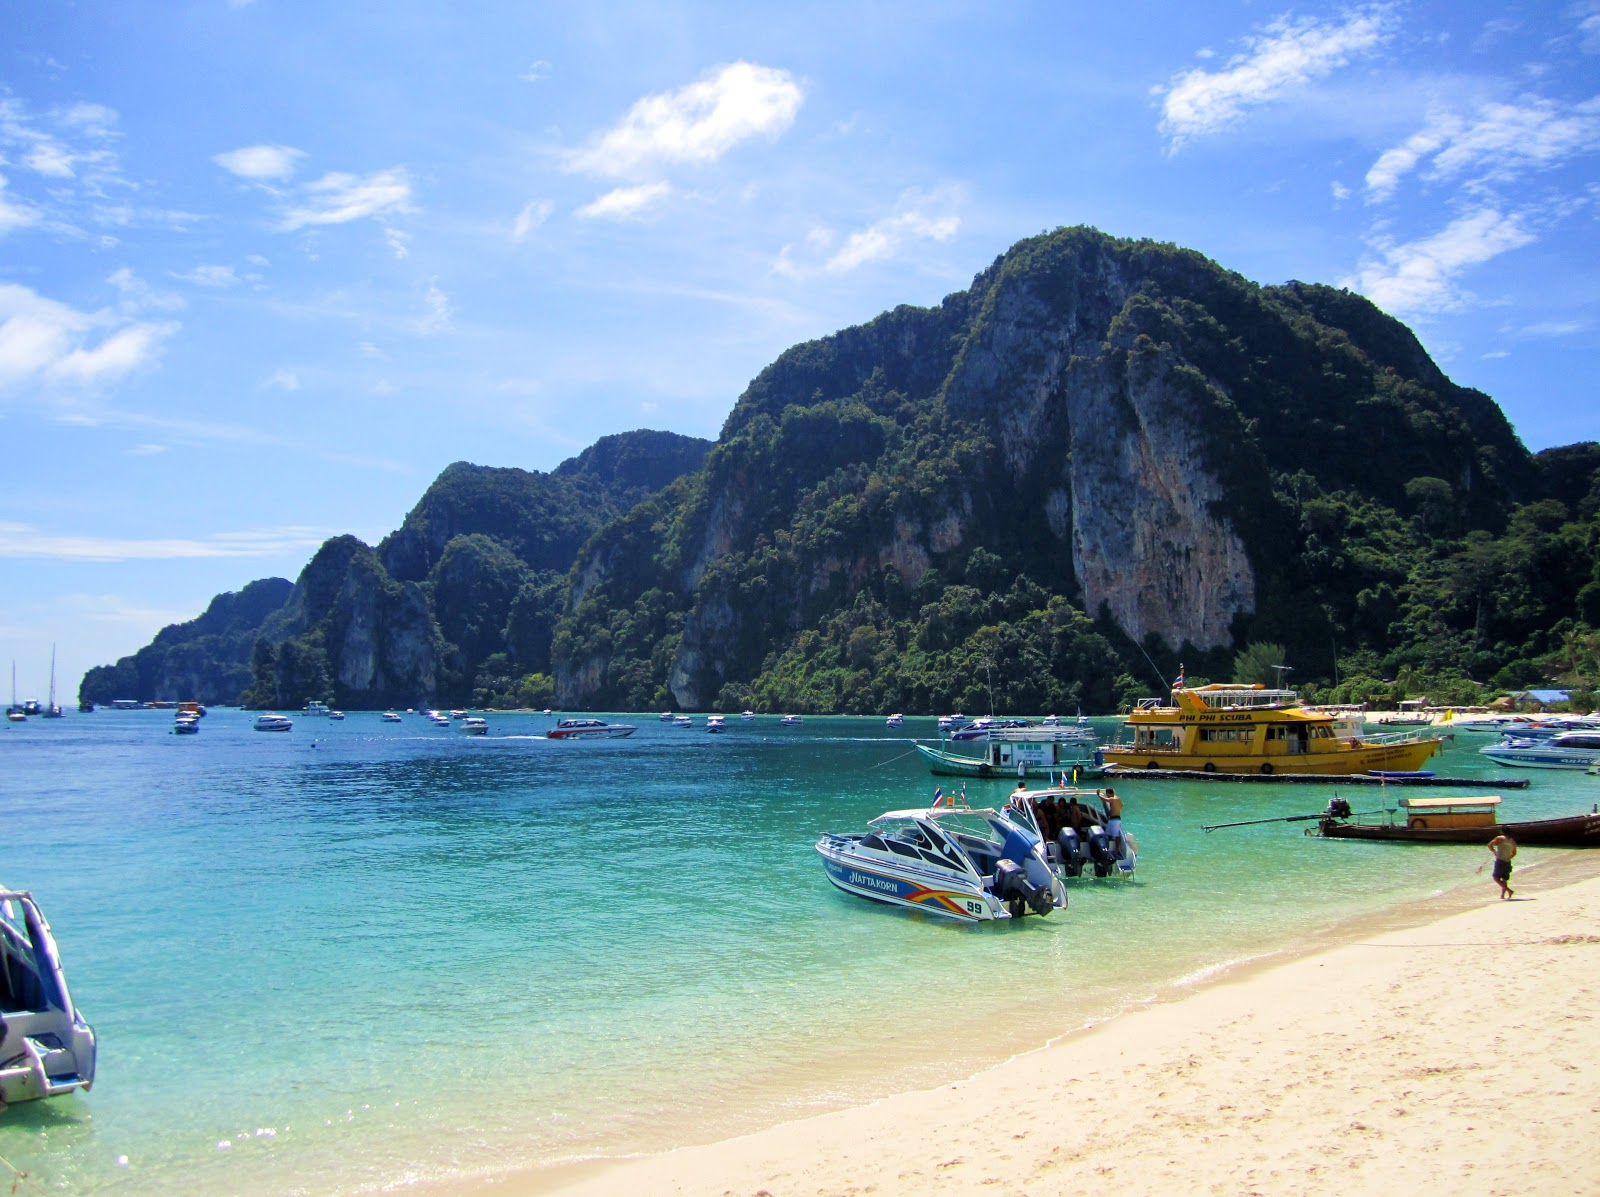 World Visits: Visit to Ko Phi Phi Travel Guide